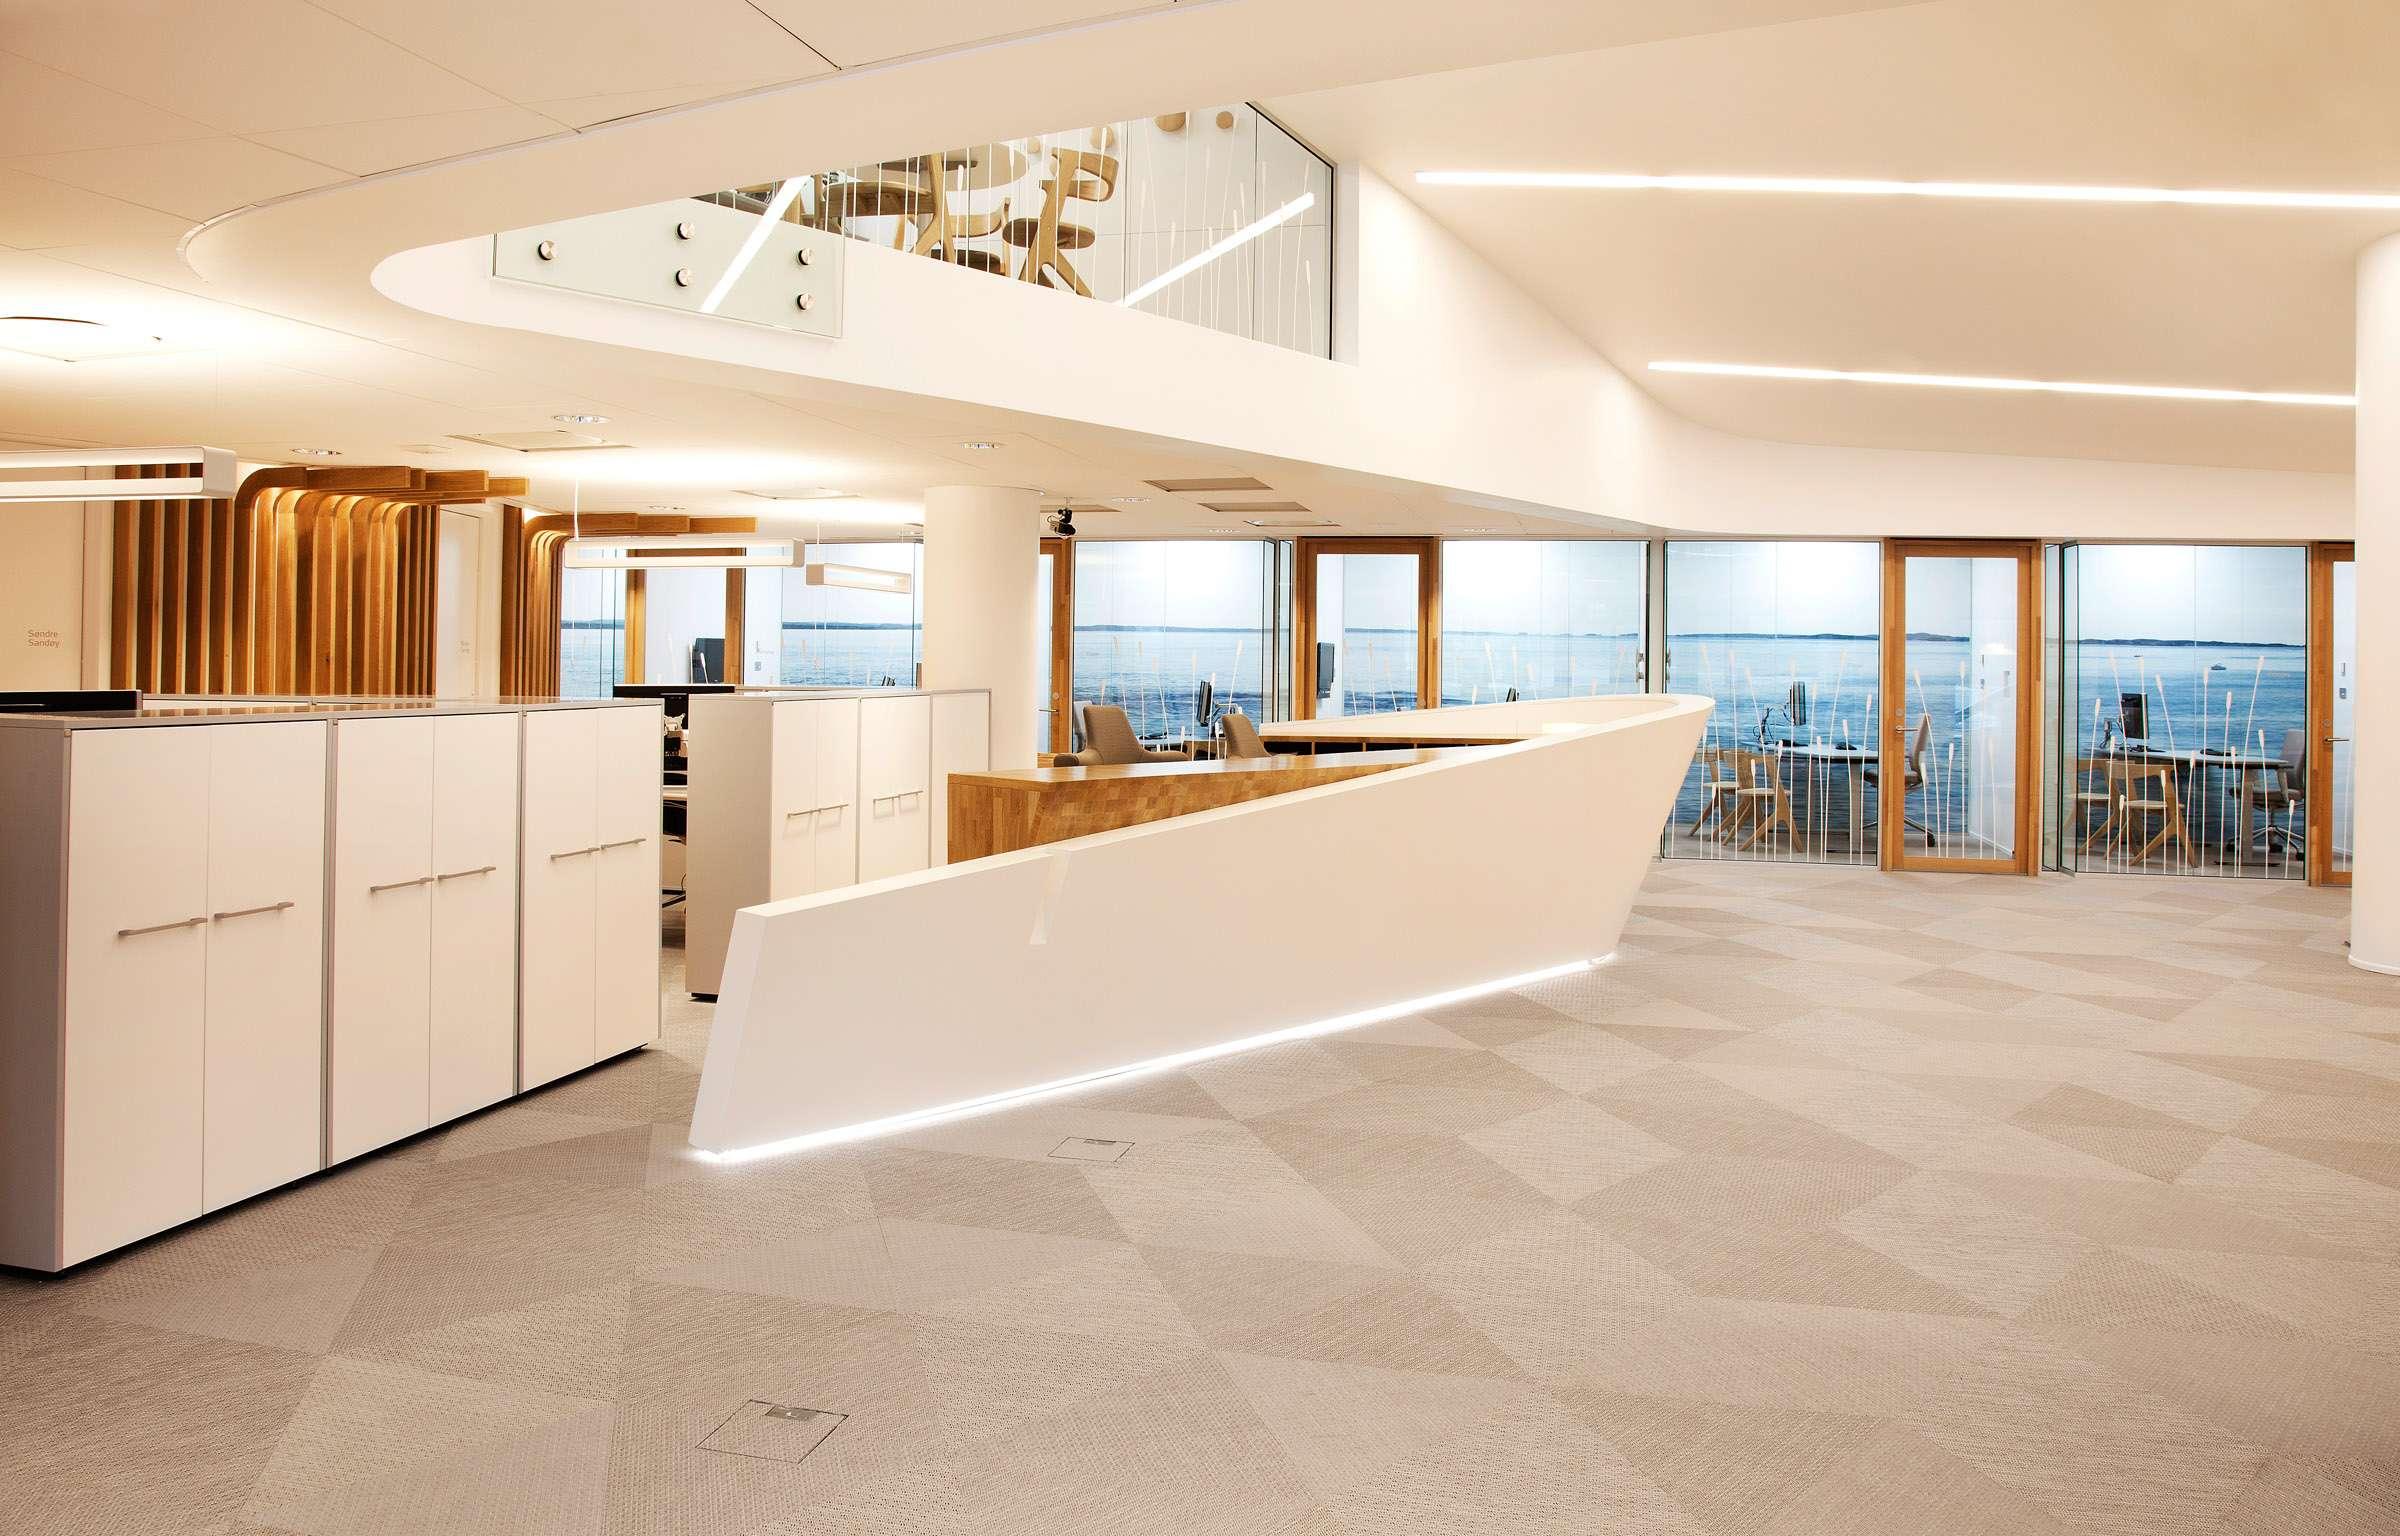 Bolon flooring in the office of Sparebank in Fredrikstad, Norway